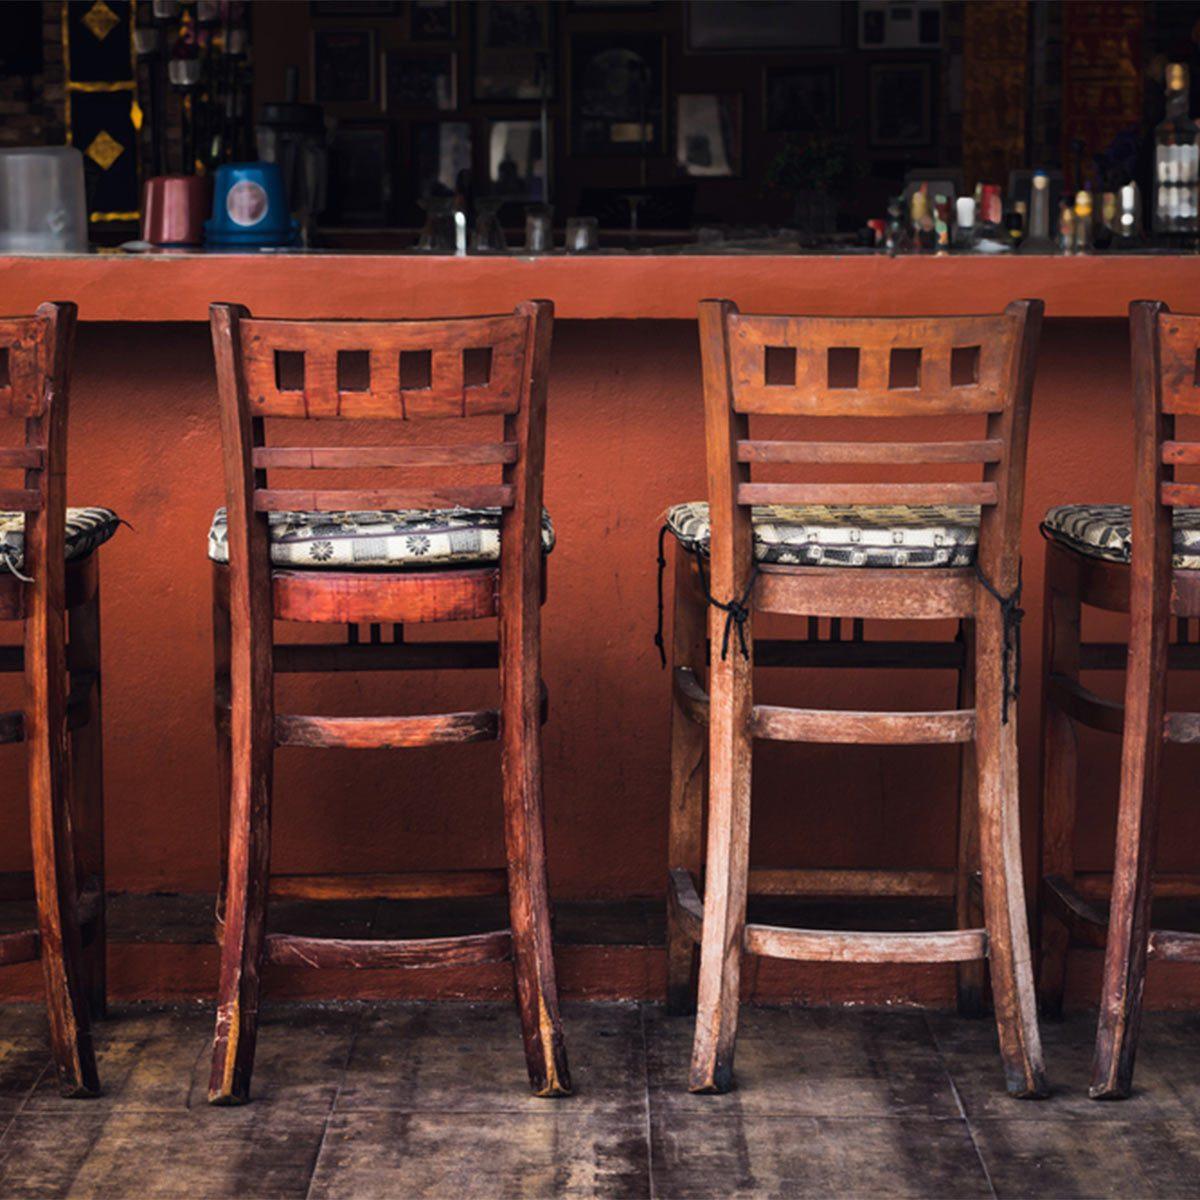 15 Home Bar Ideas for the Perfect Bar Design — The Family Handyman